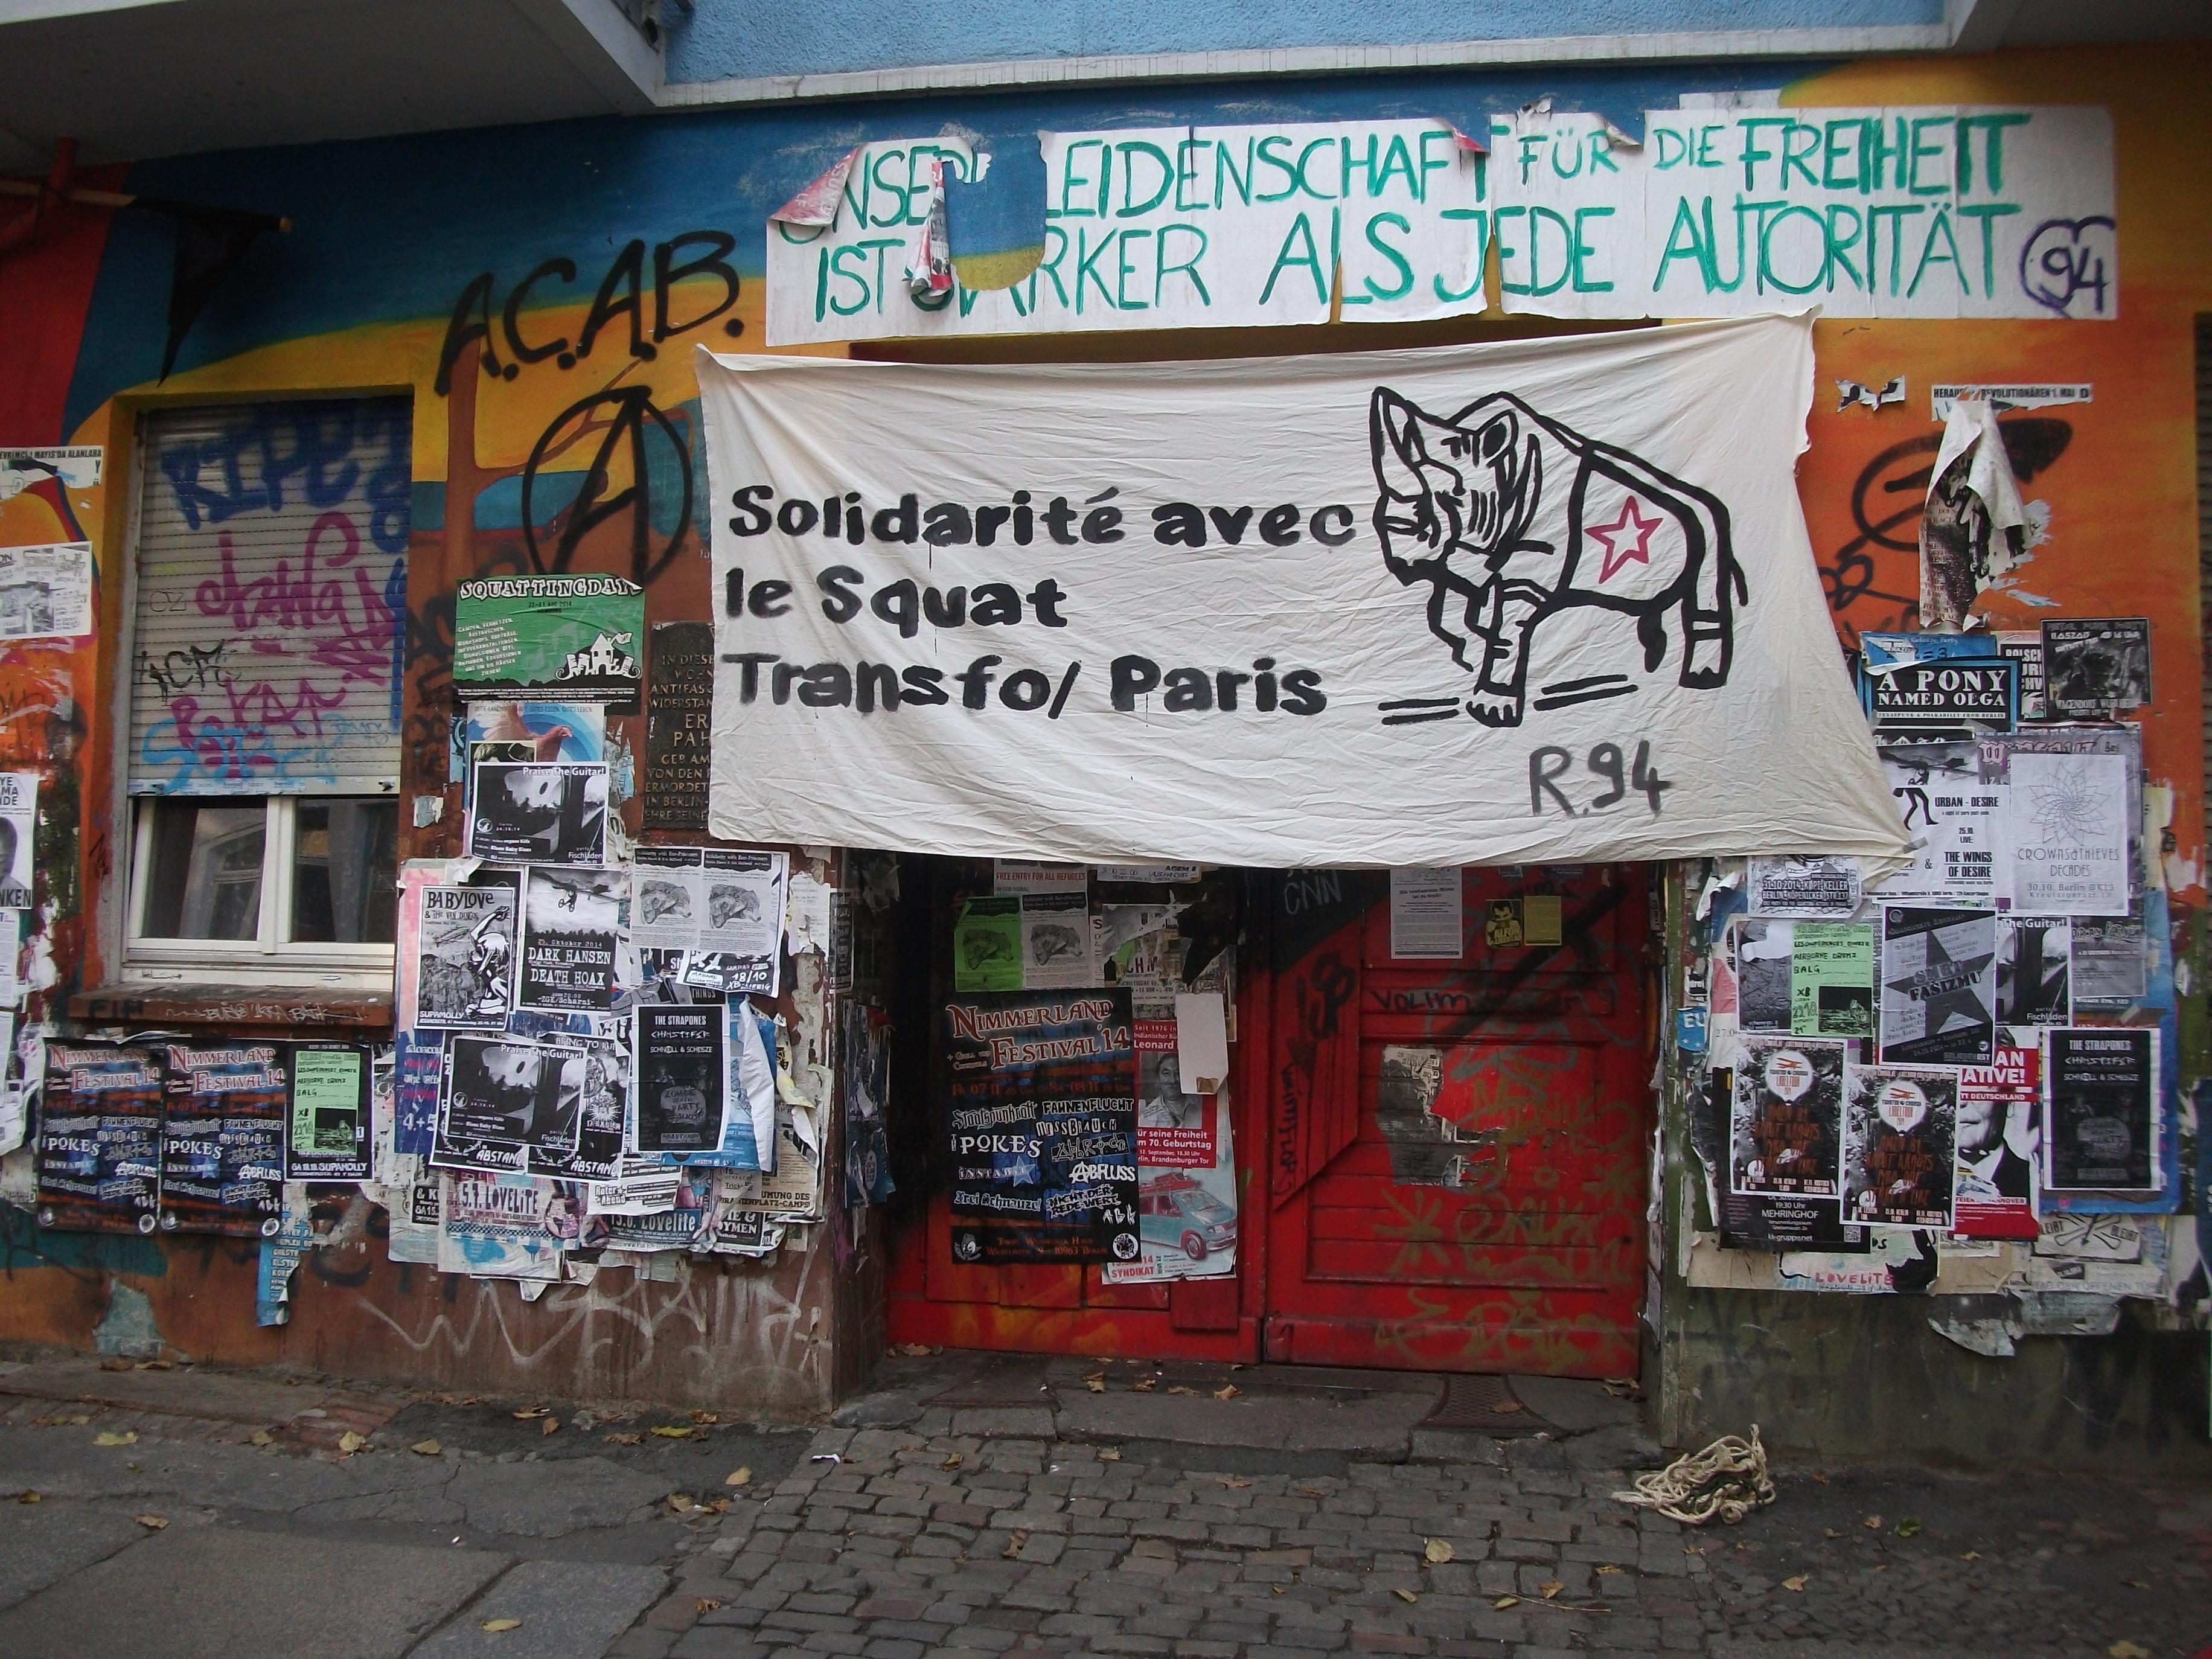 2014-10_Berlin_Rigaer94_solidaritatmittransfo